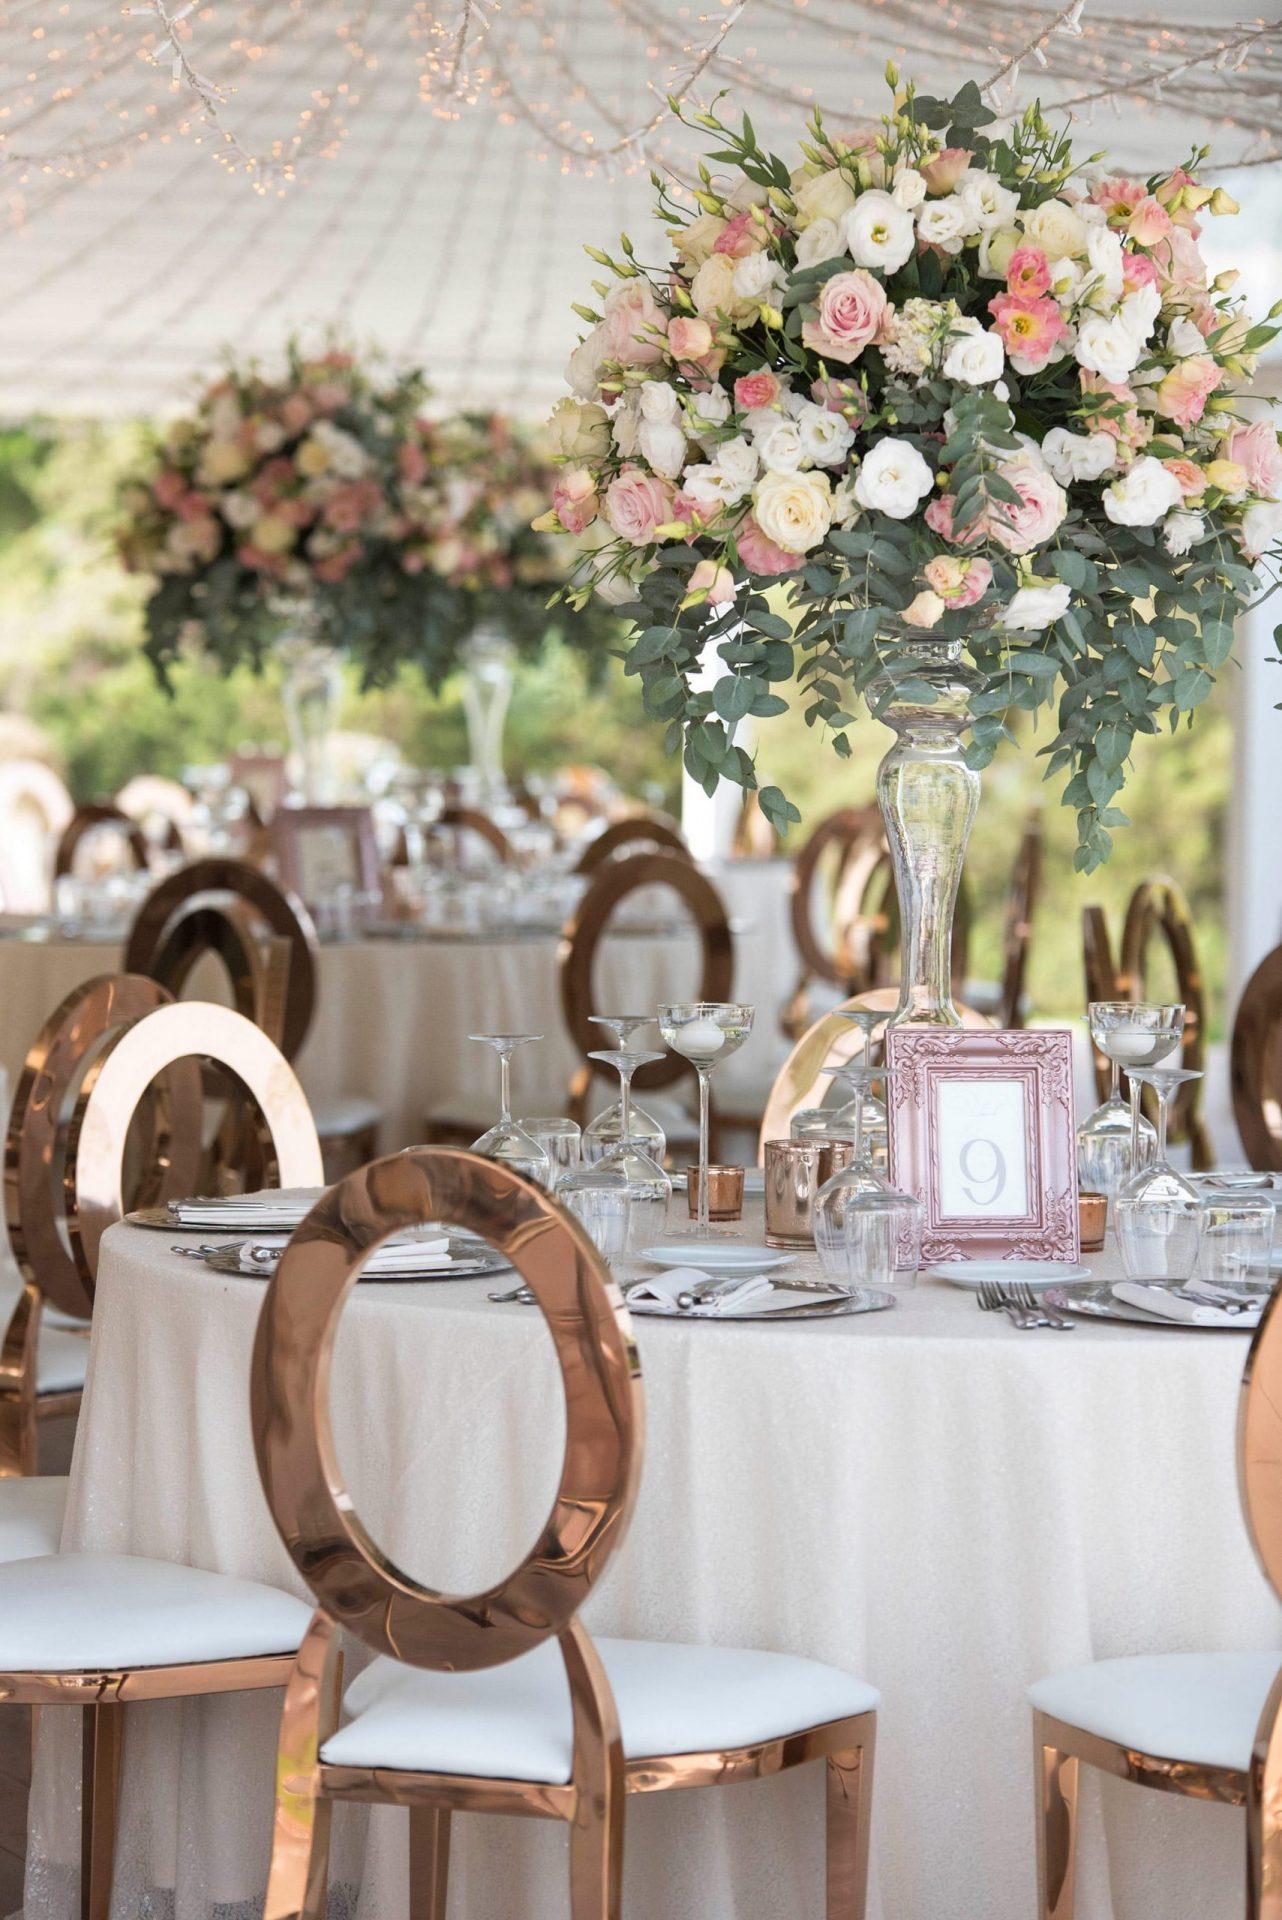 Enza e Samuele, wedding reception, elegant flower centrepiece